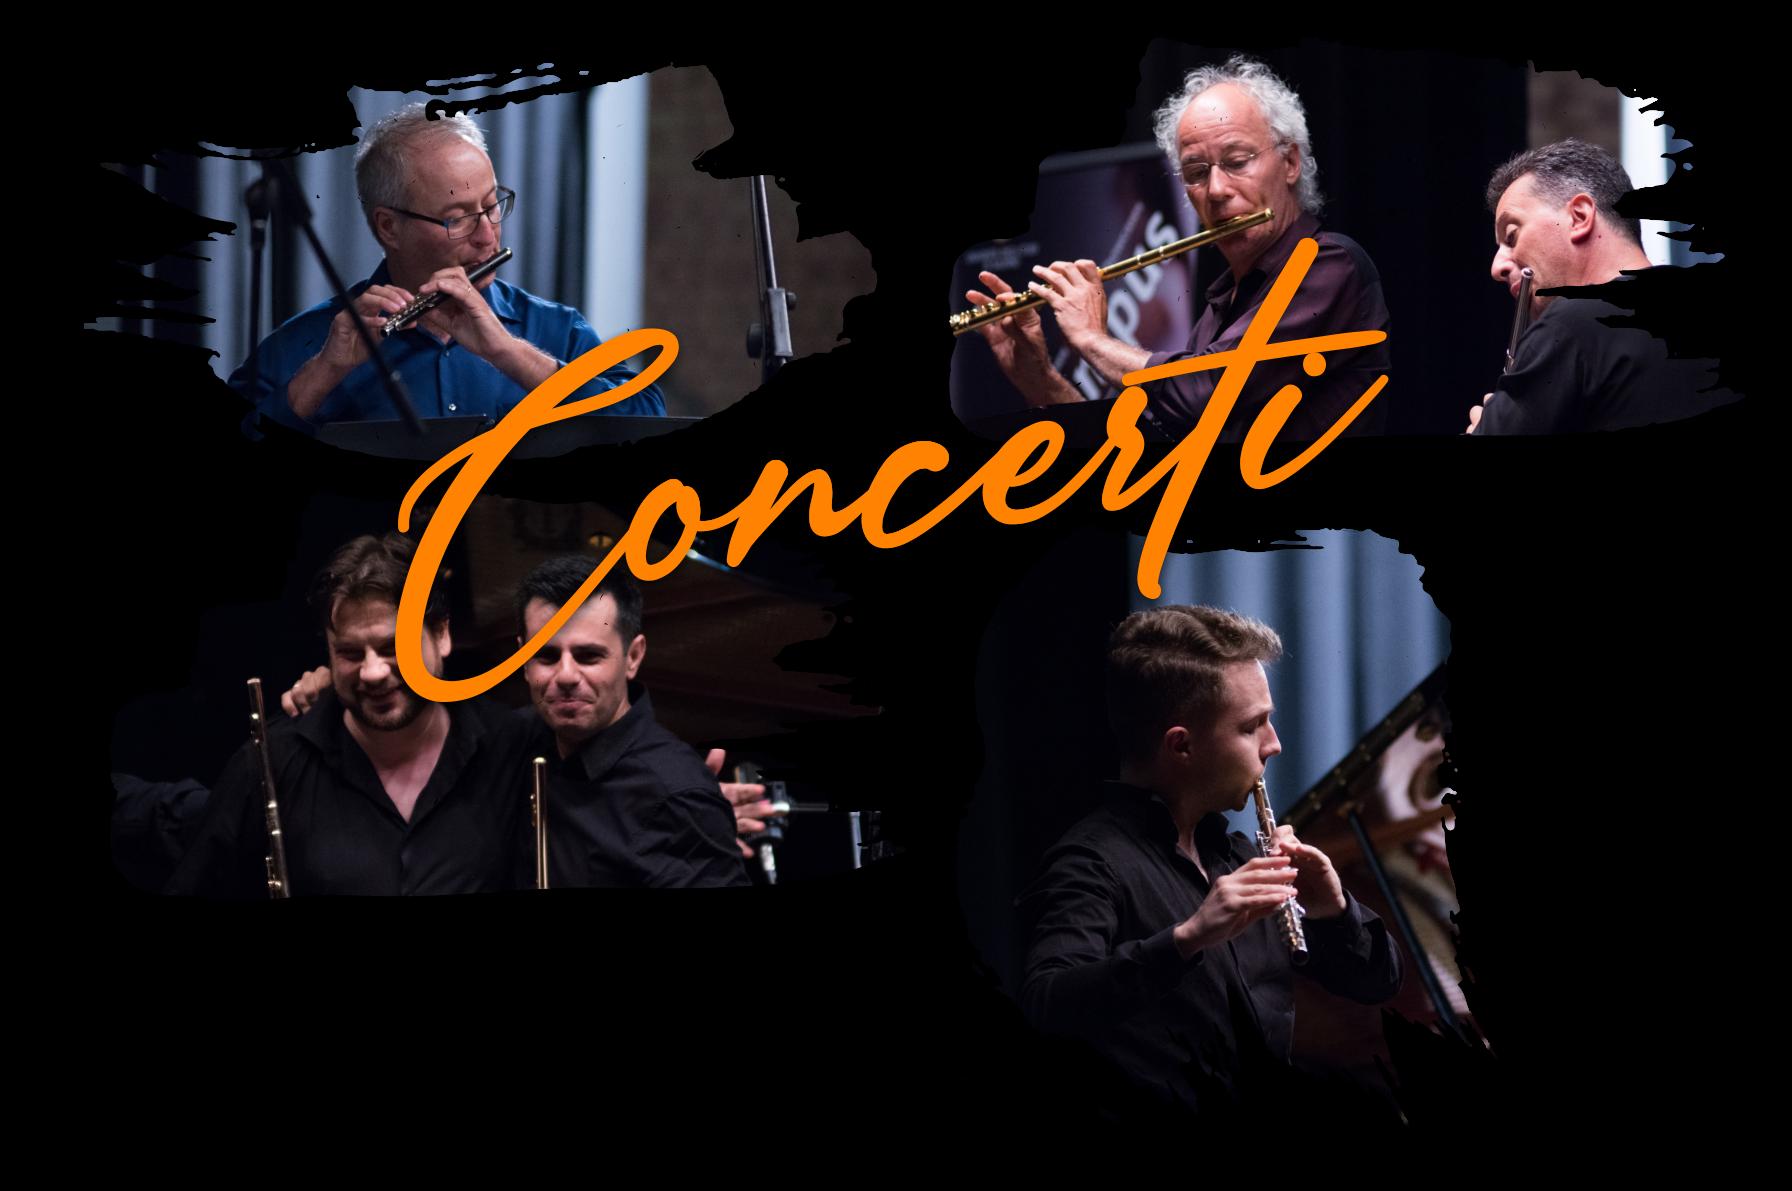 Concerti 2